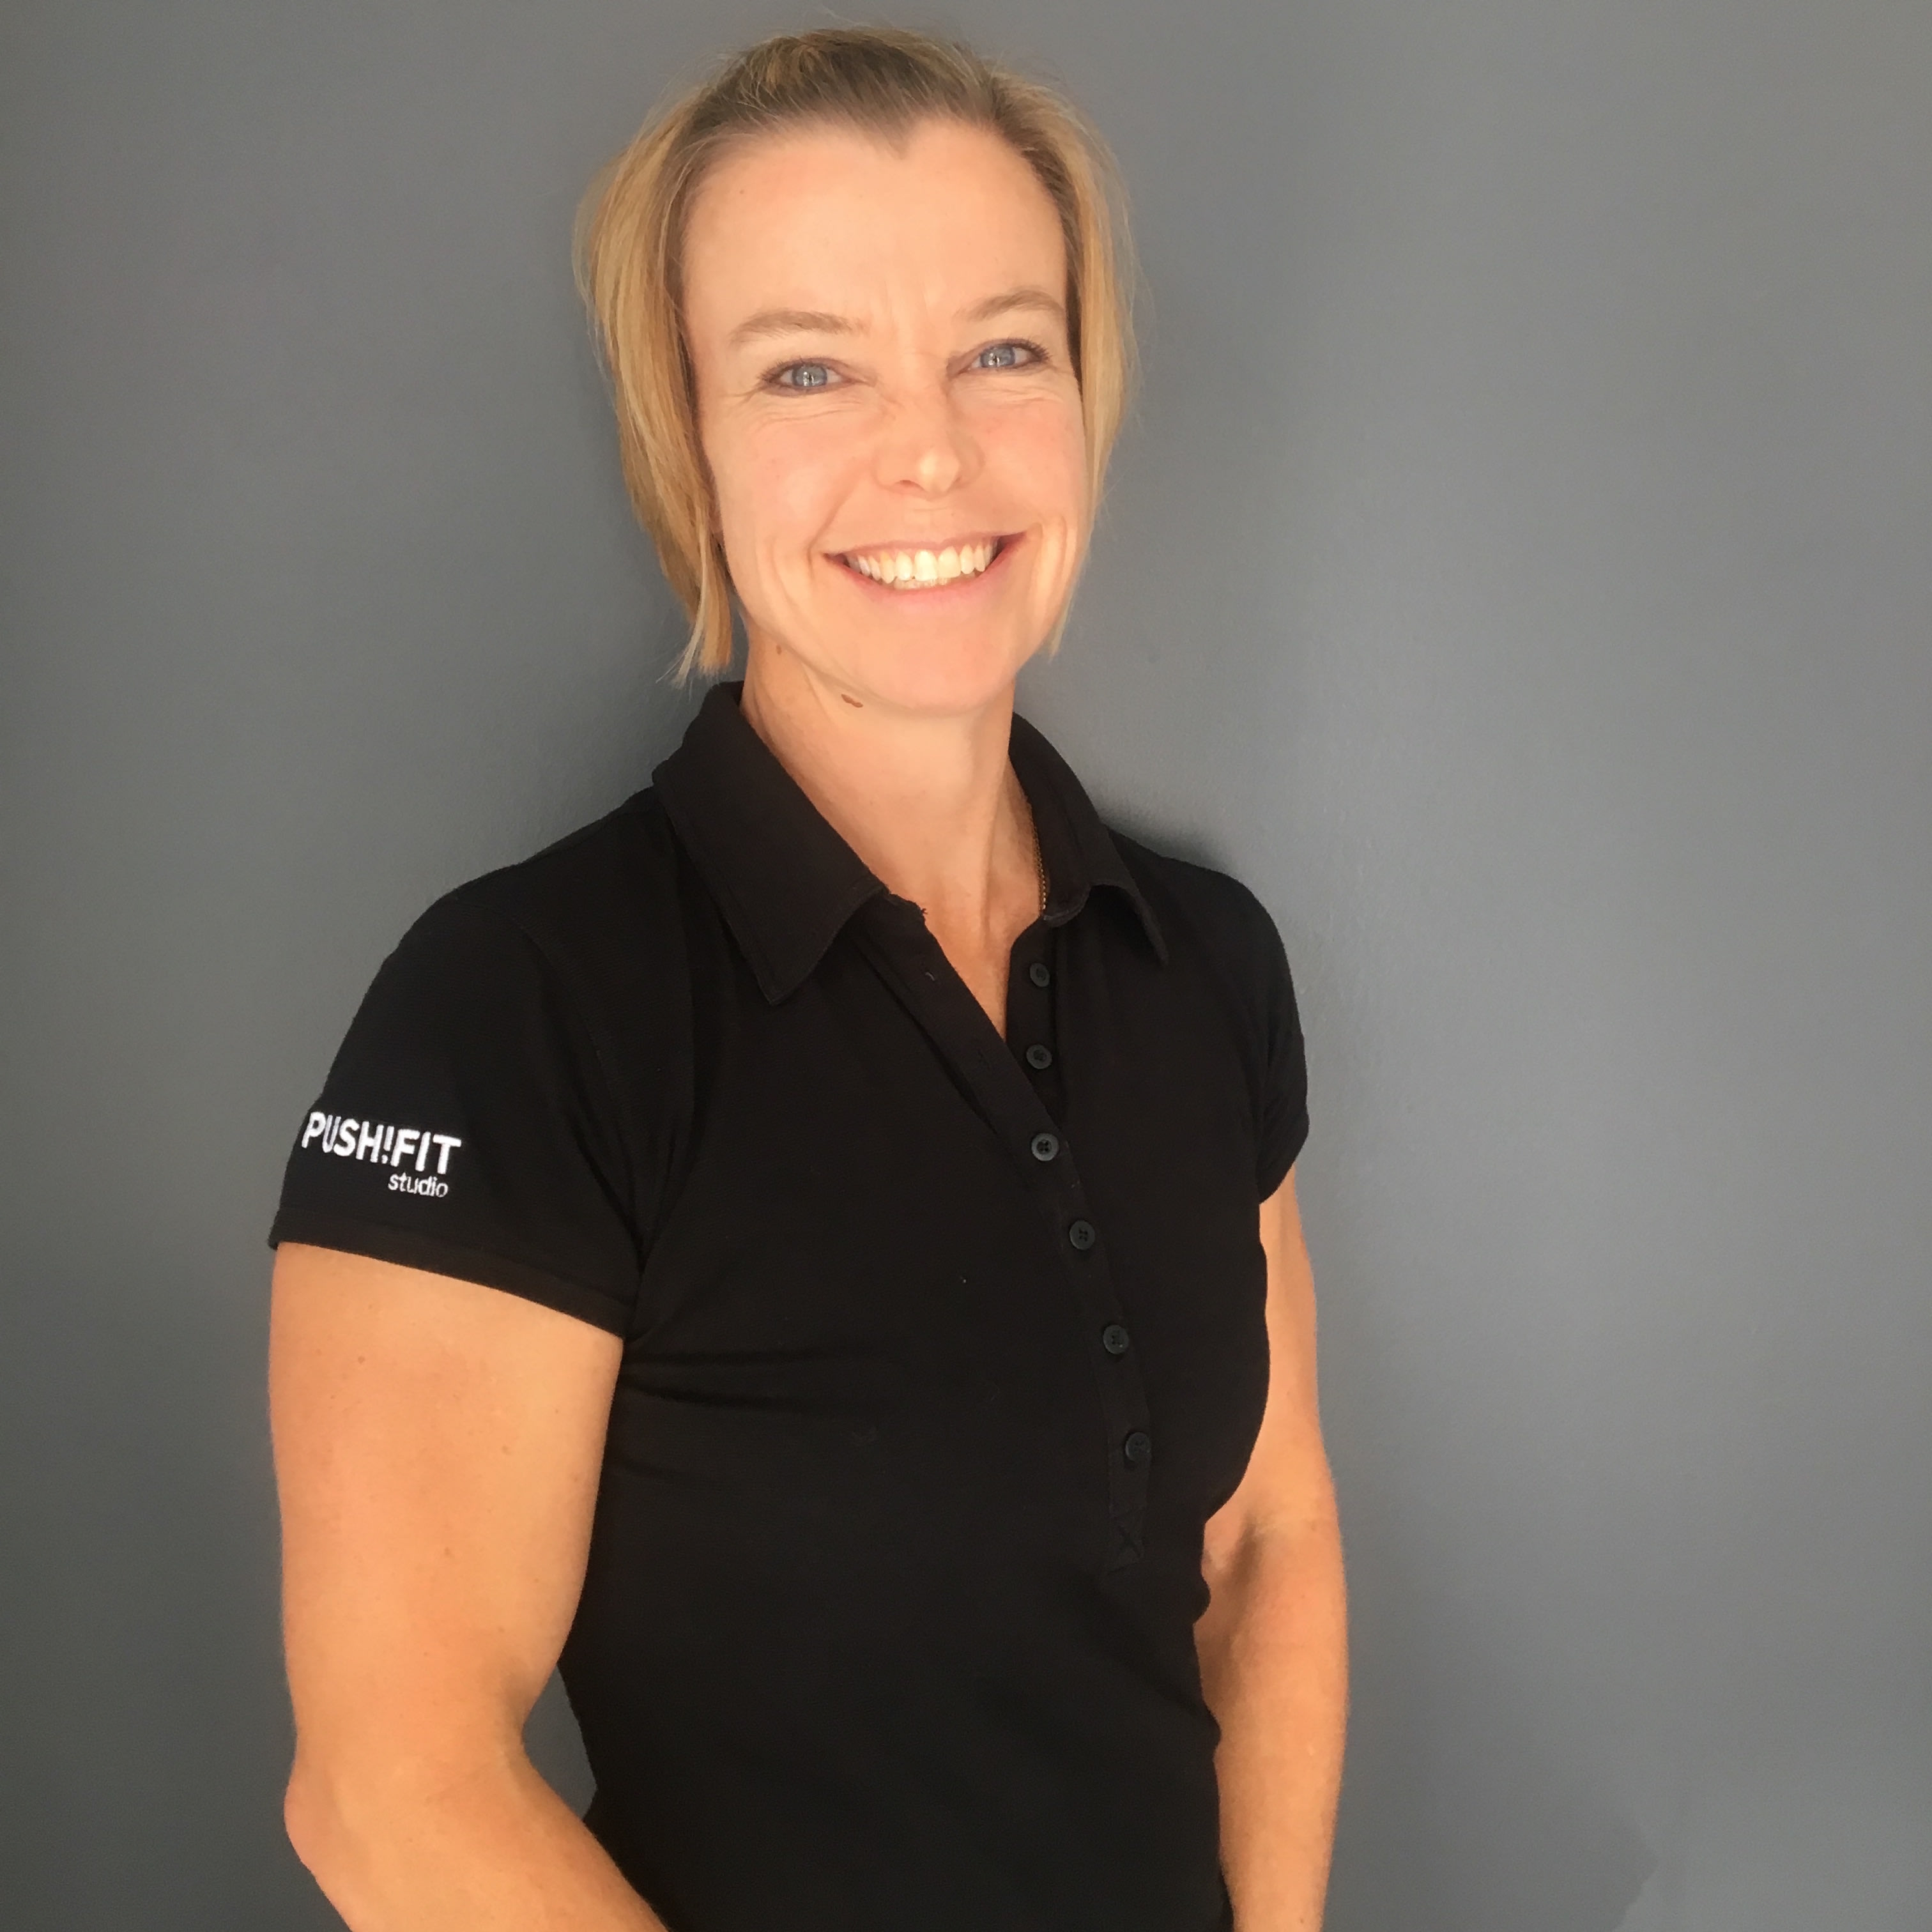 Christine Chisholm in Burlington - push!FITstudio